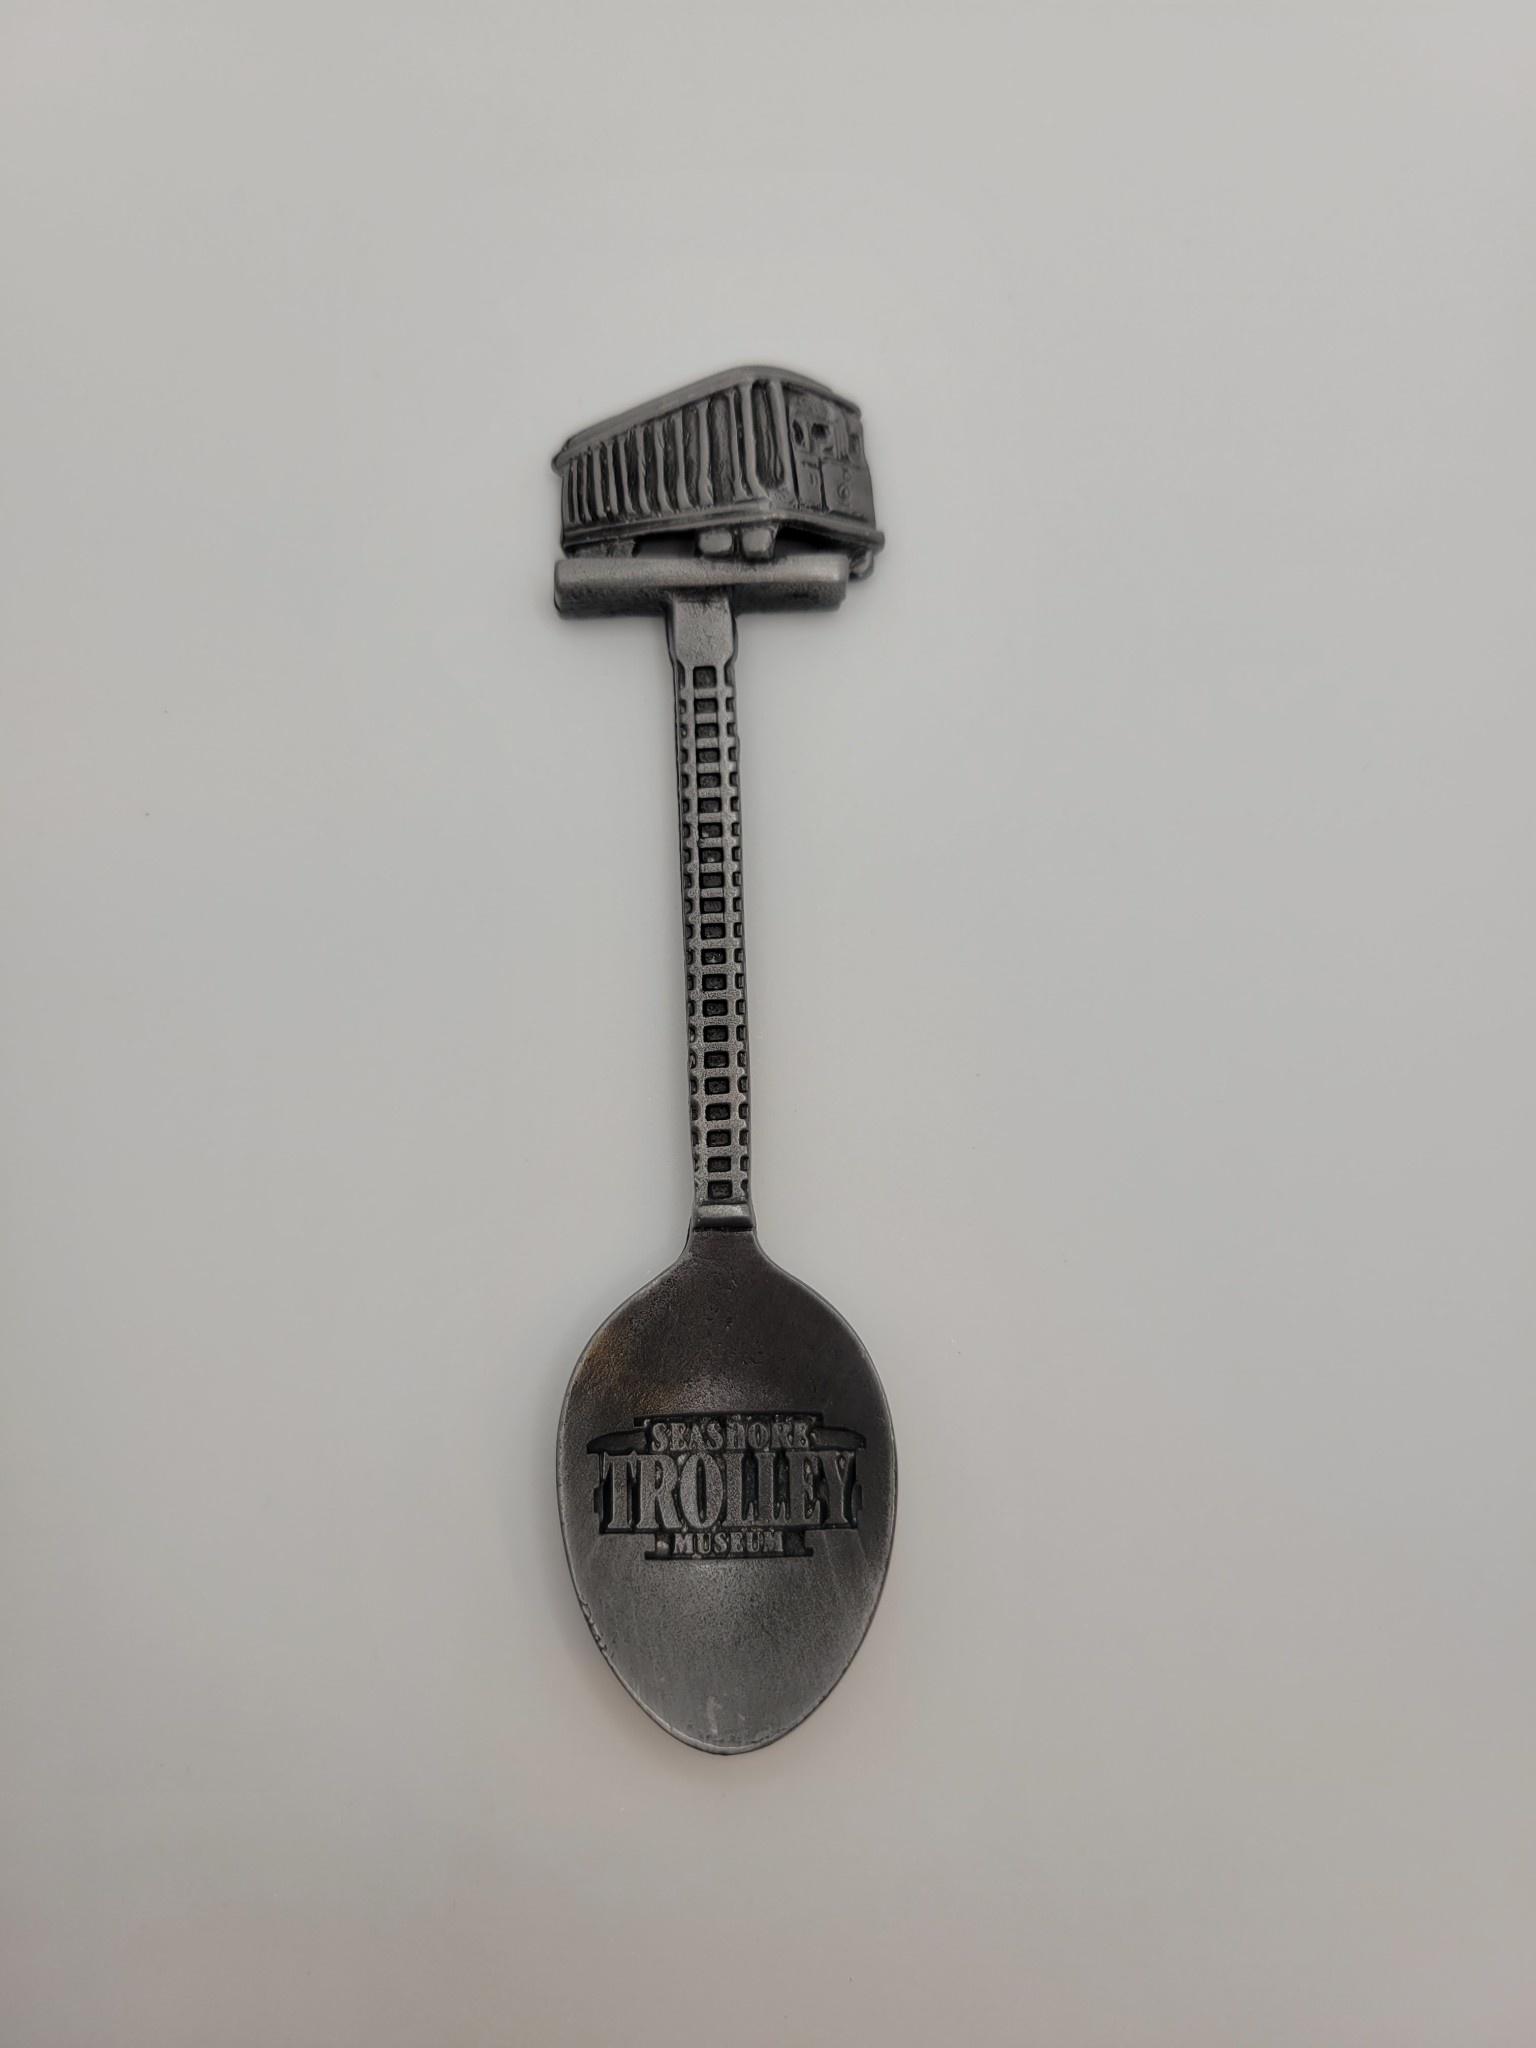 STM Pewter Spoon